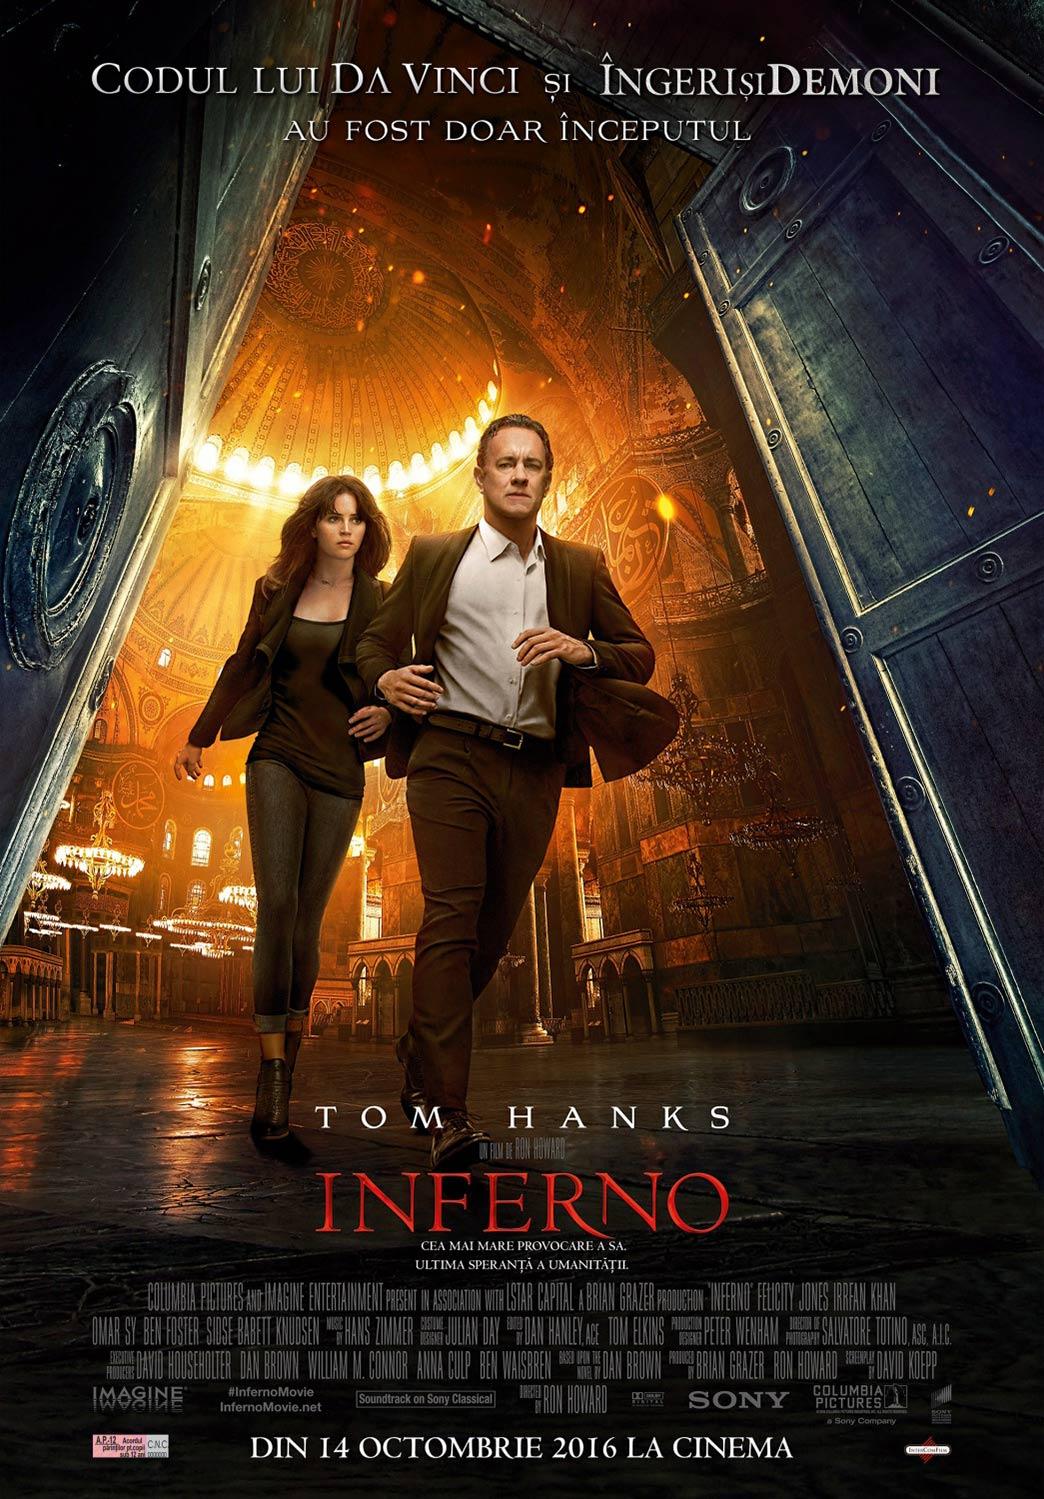 Inferno (2016) Movie In Hindi 720P